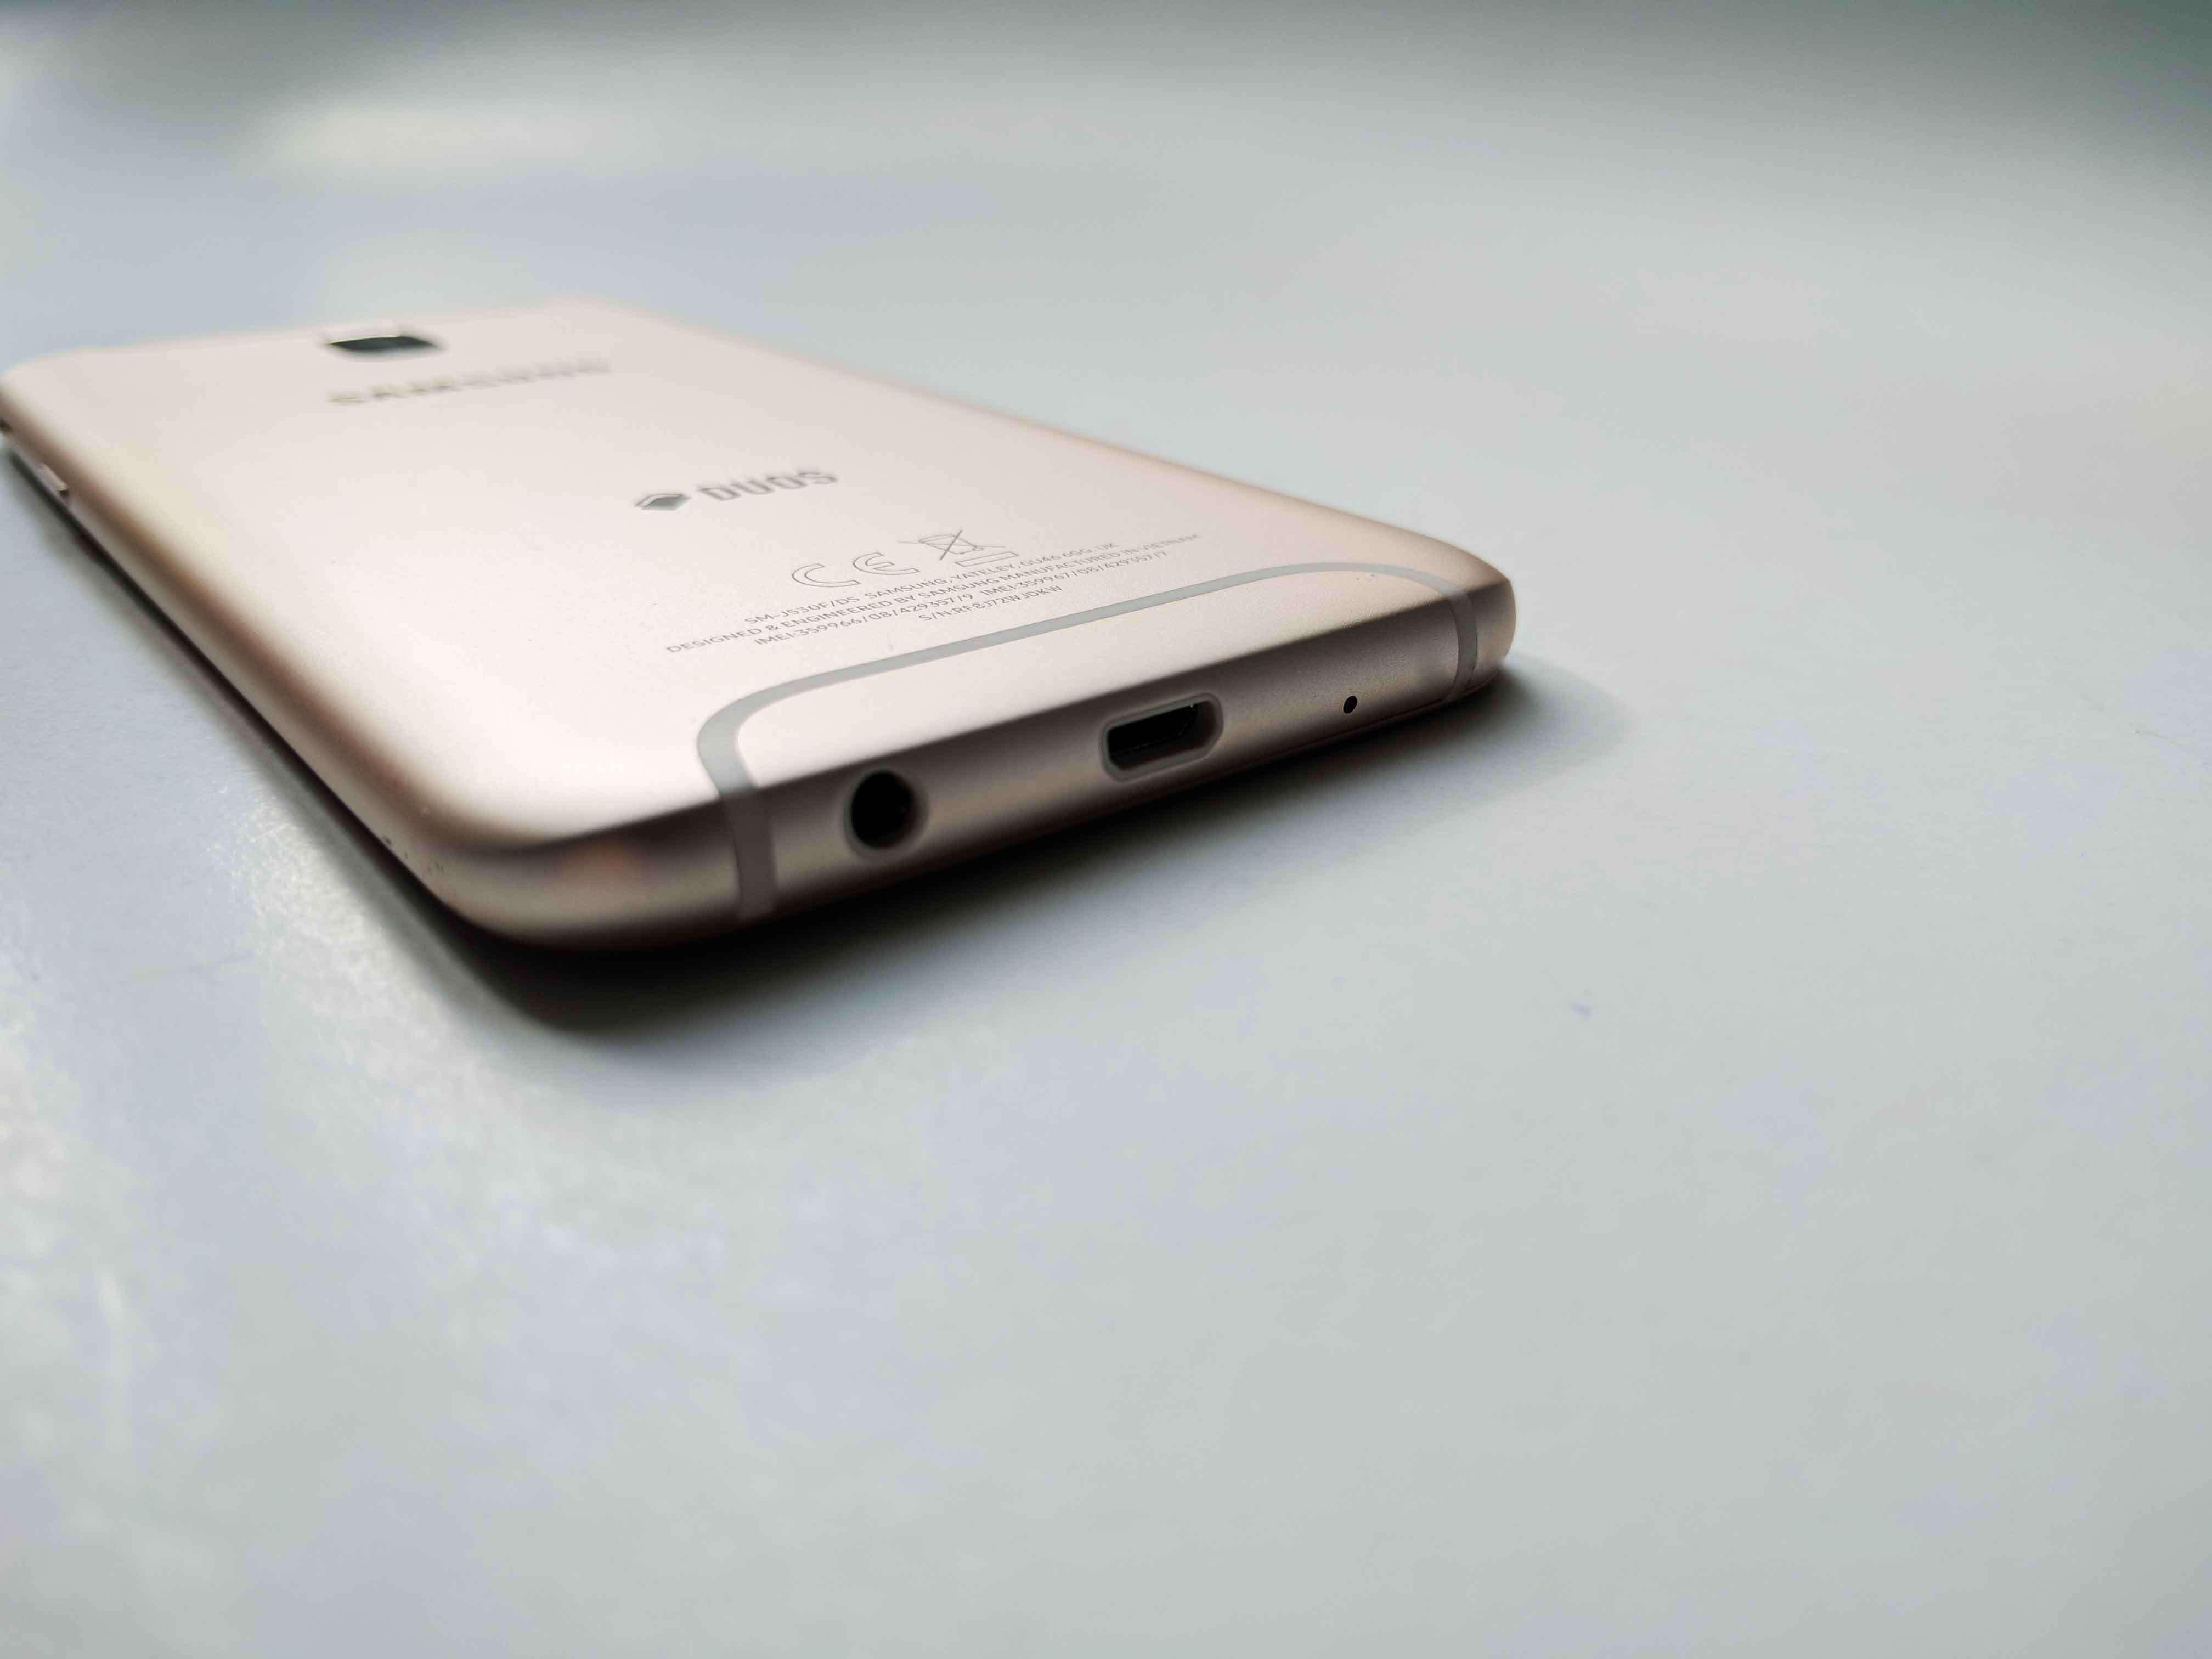 Samsung Galaxy J5 (2017) Review Romana, Pareri - foto 7